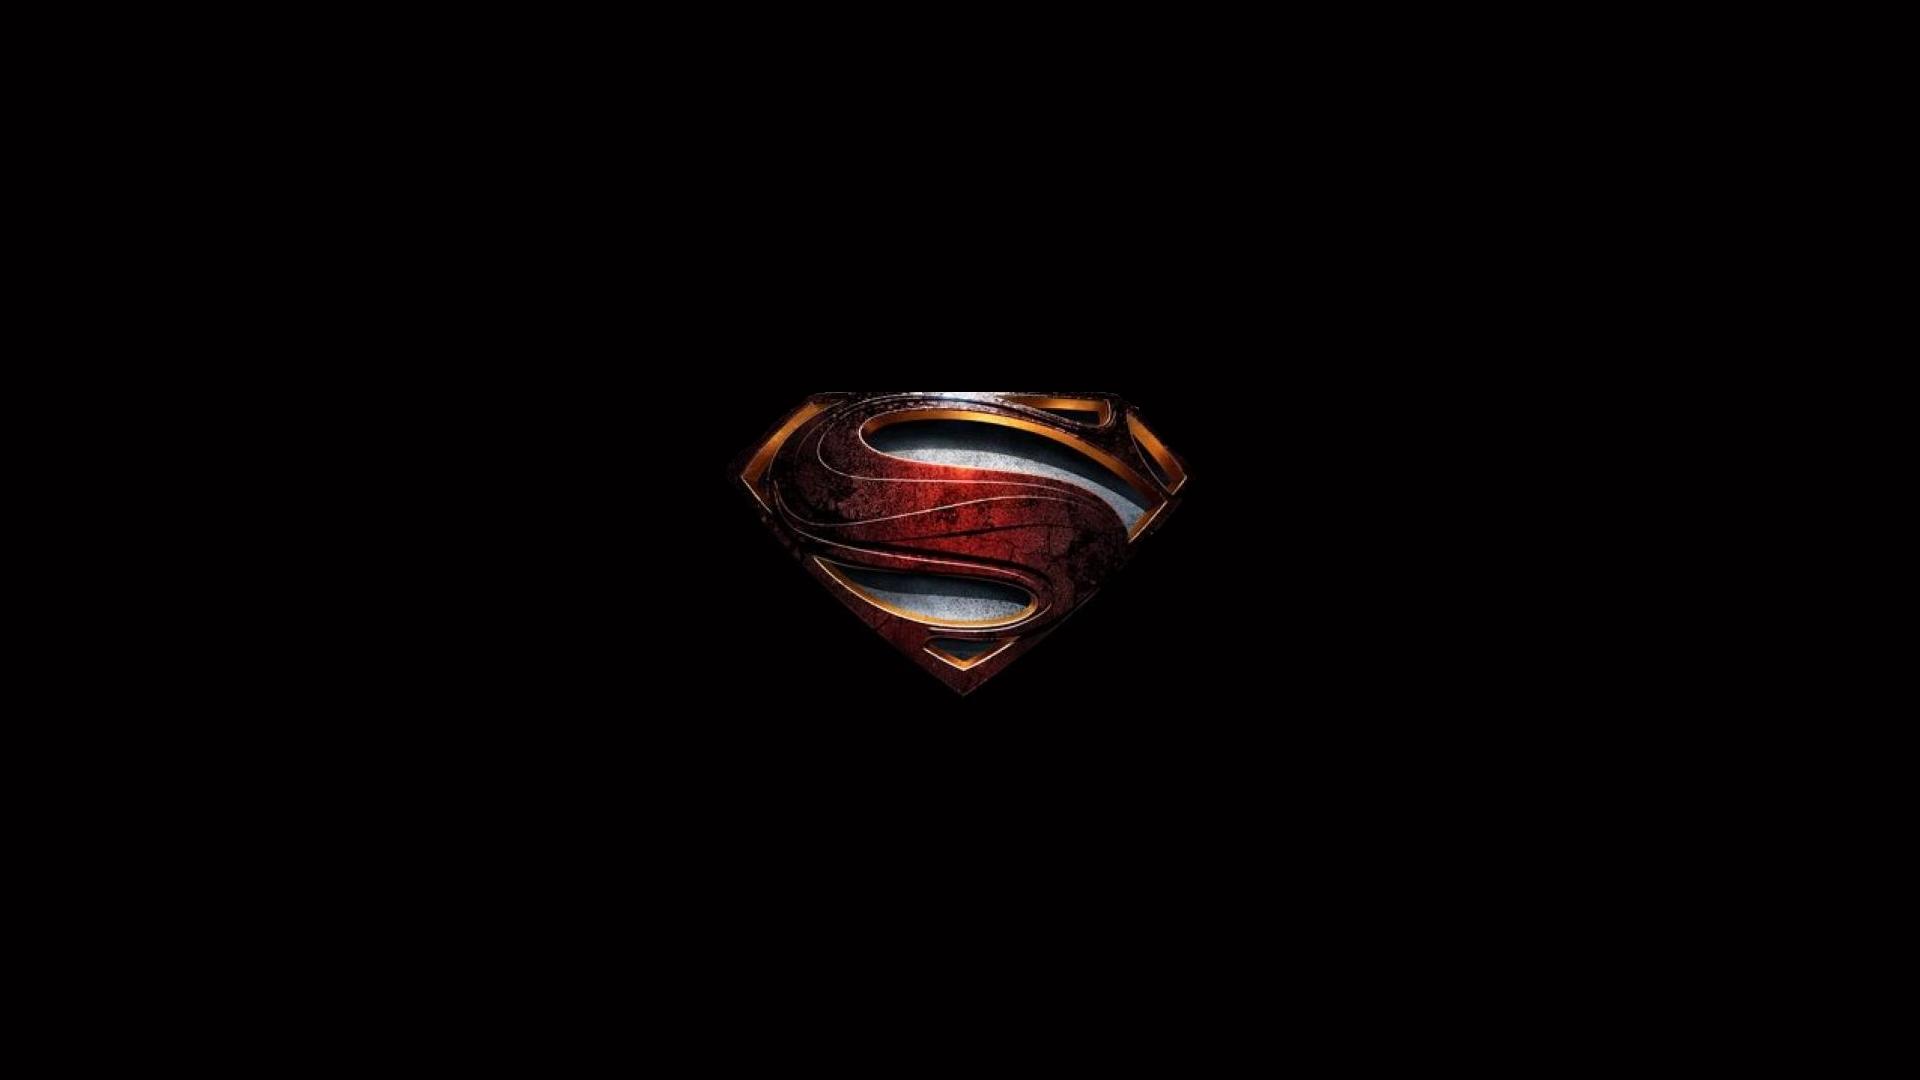 Superheroes Logos Wallpapers 1920x1080